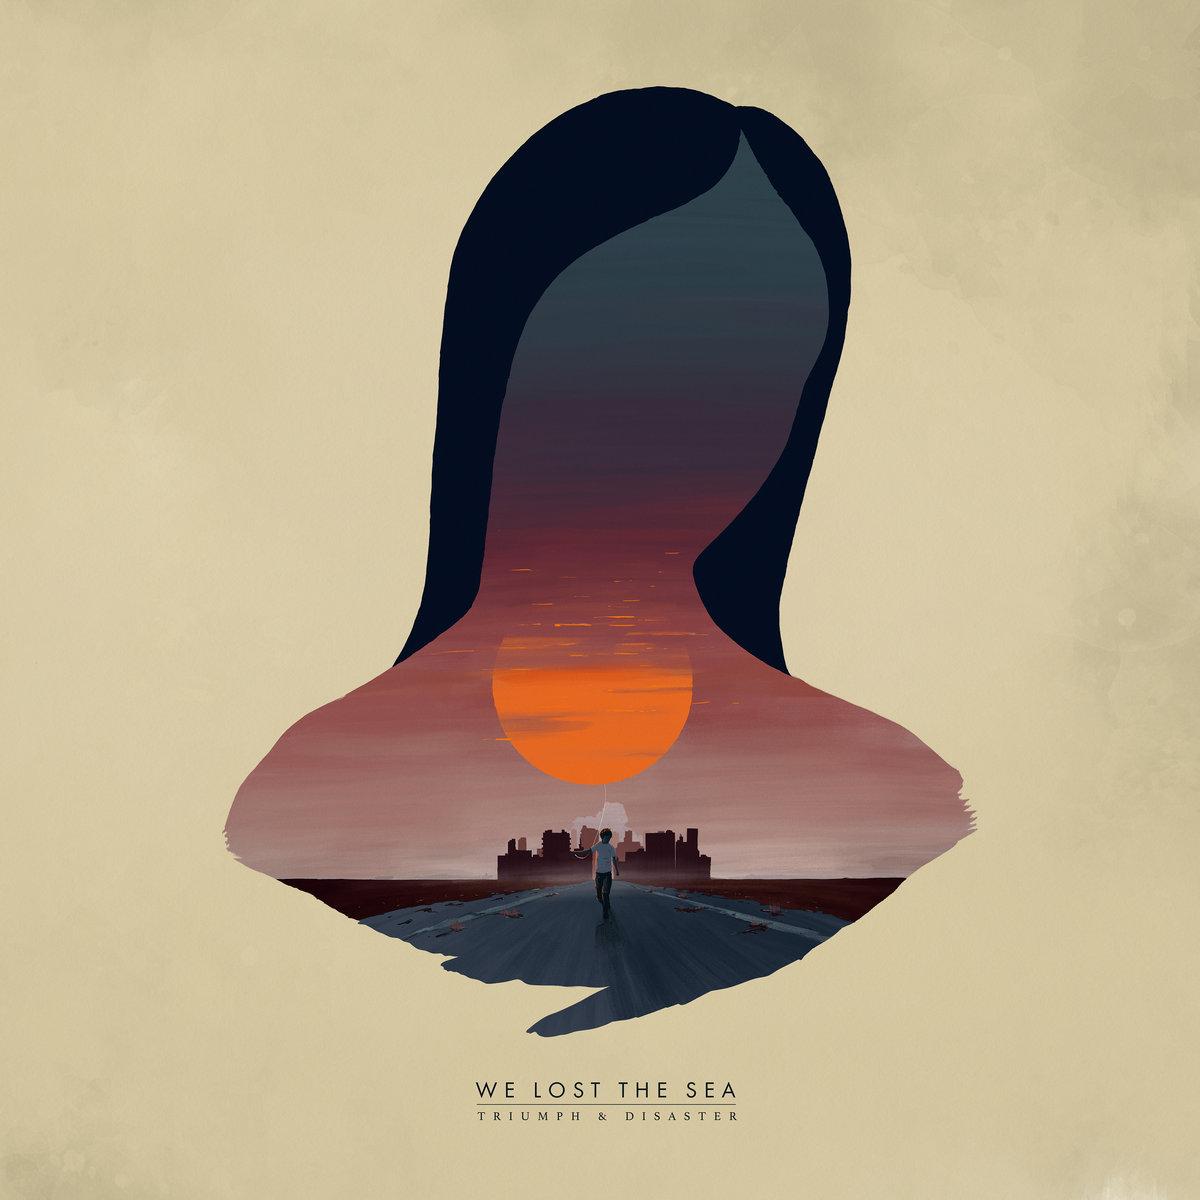 We Lost The Sea - Triumph & Disaster LP